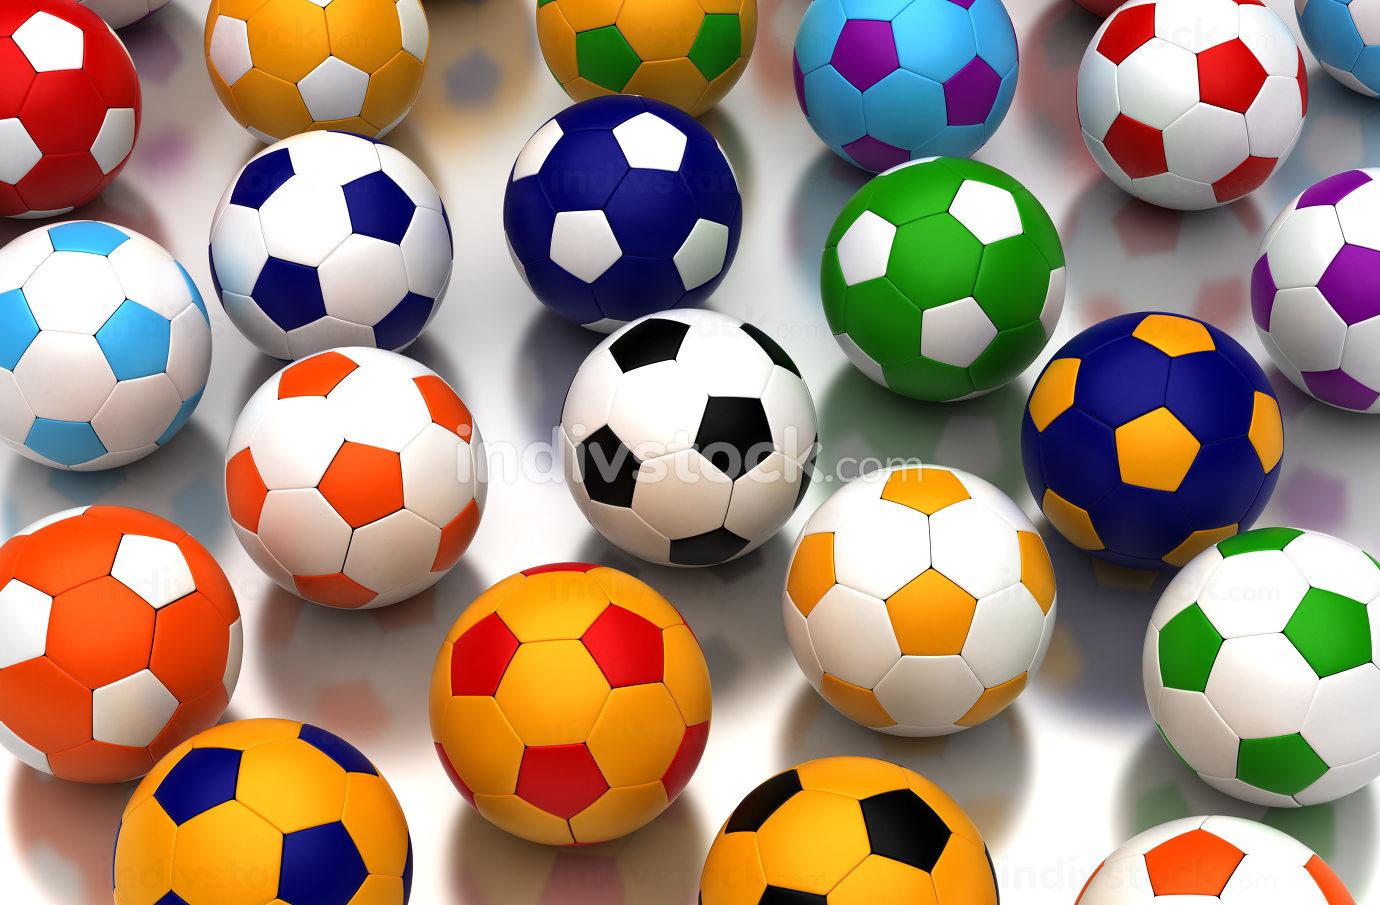 Colorful Soccer Balls